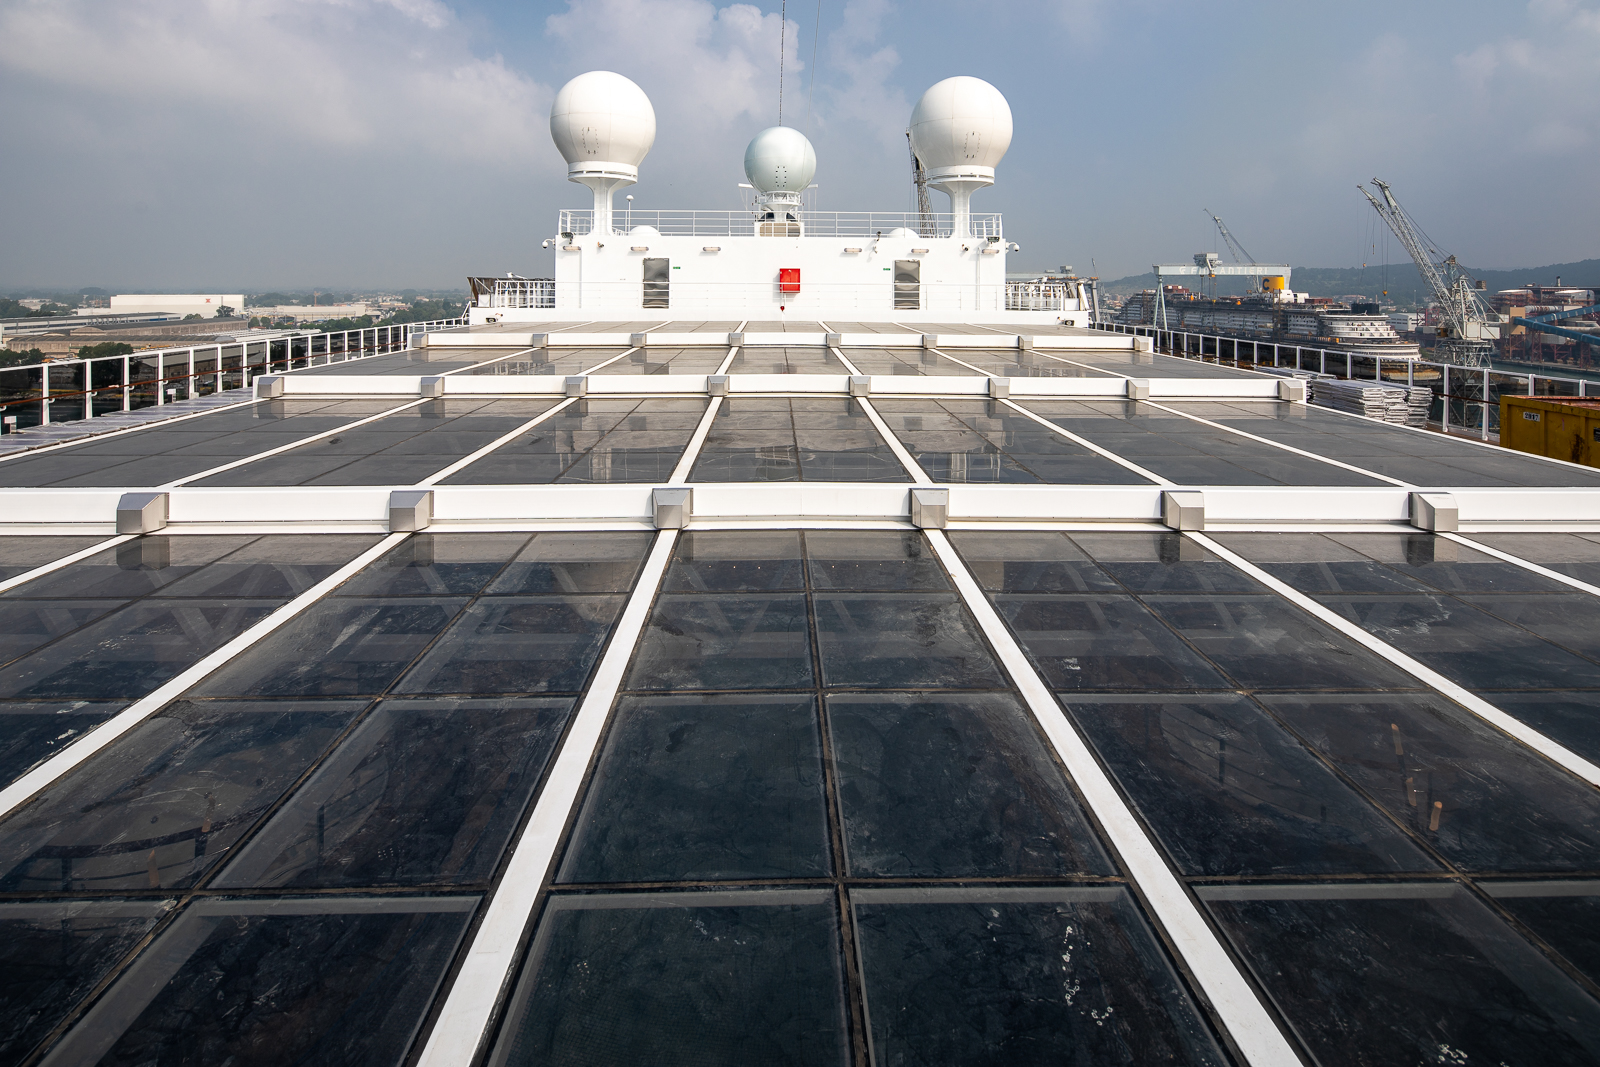 skydome magrodome navim cruise vessel